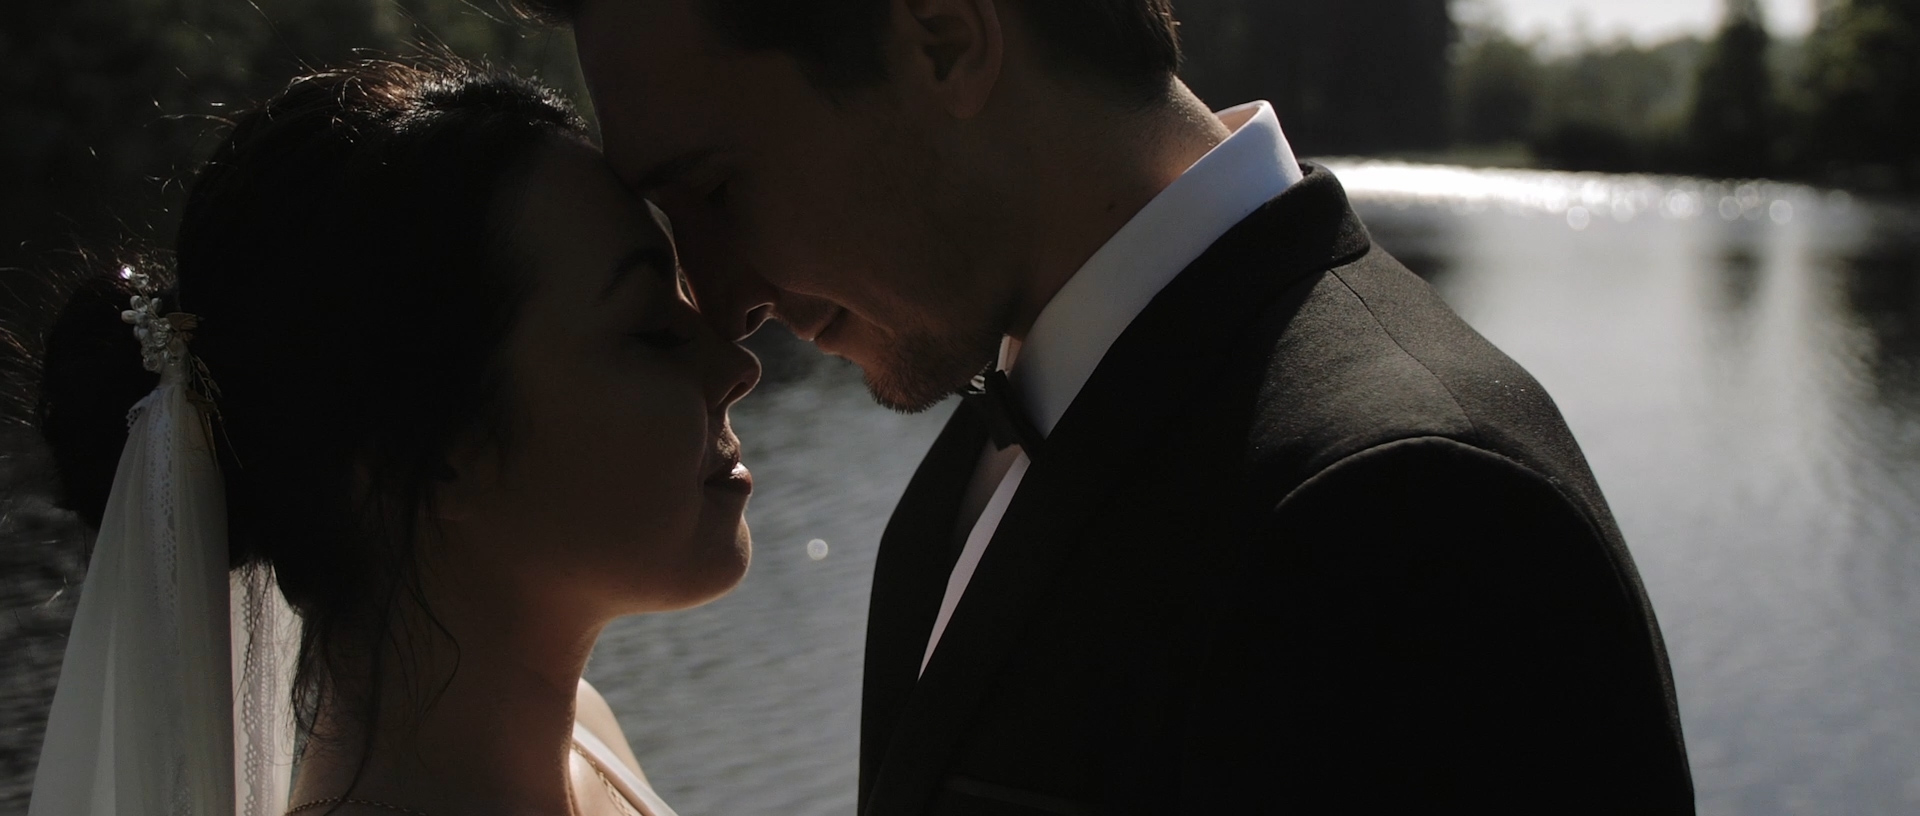 the-byre-at-inchyra-wedding-videographer_LL_07.jpg